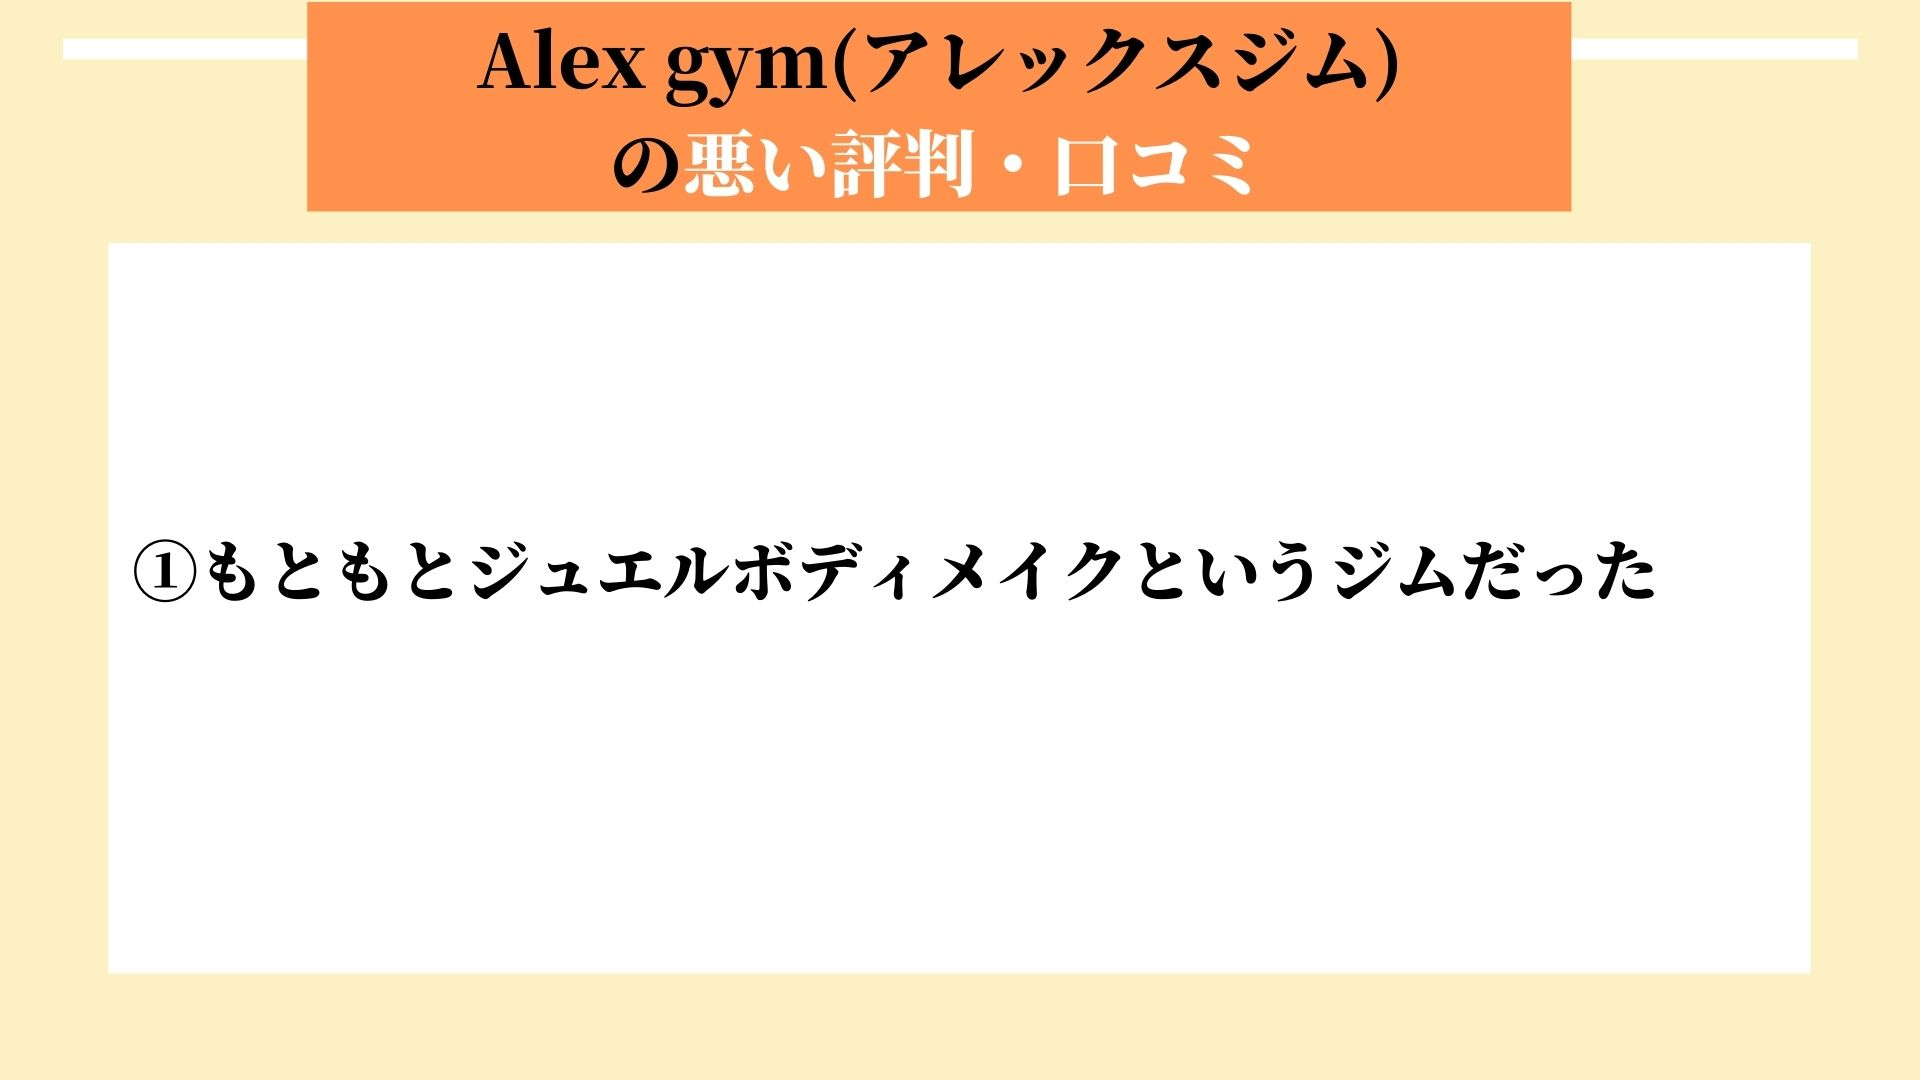 Alex gym(アレックスジム) 悪い評判